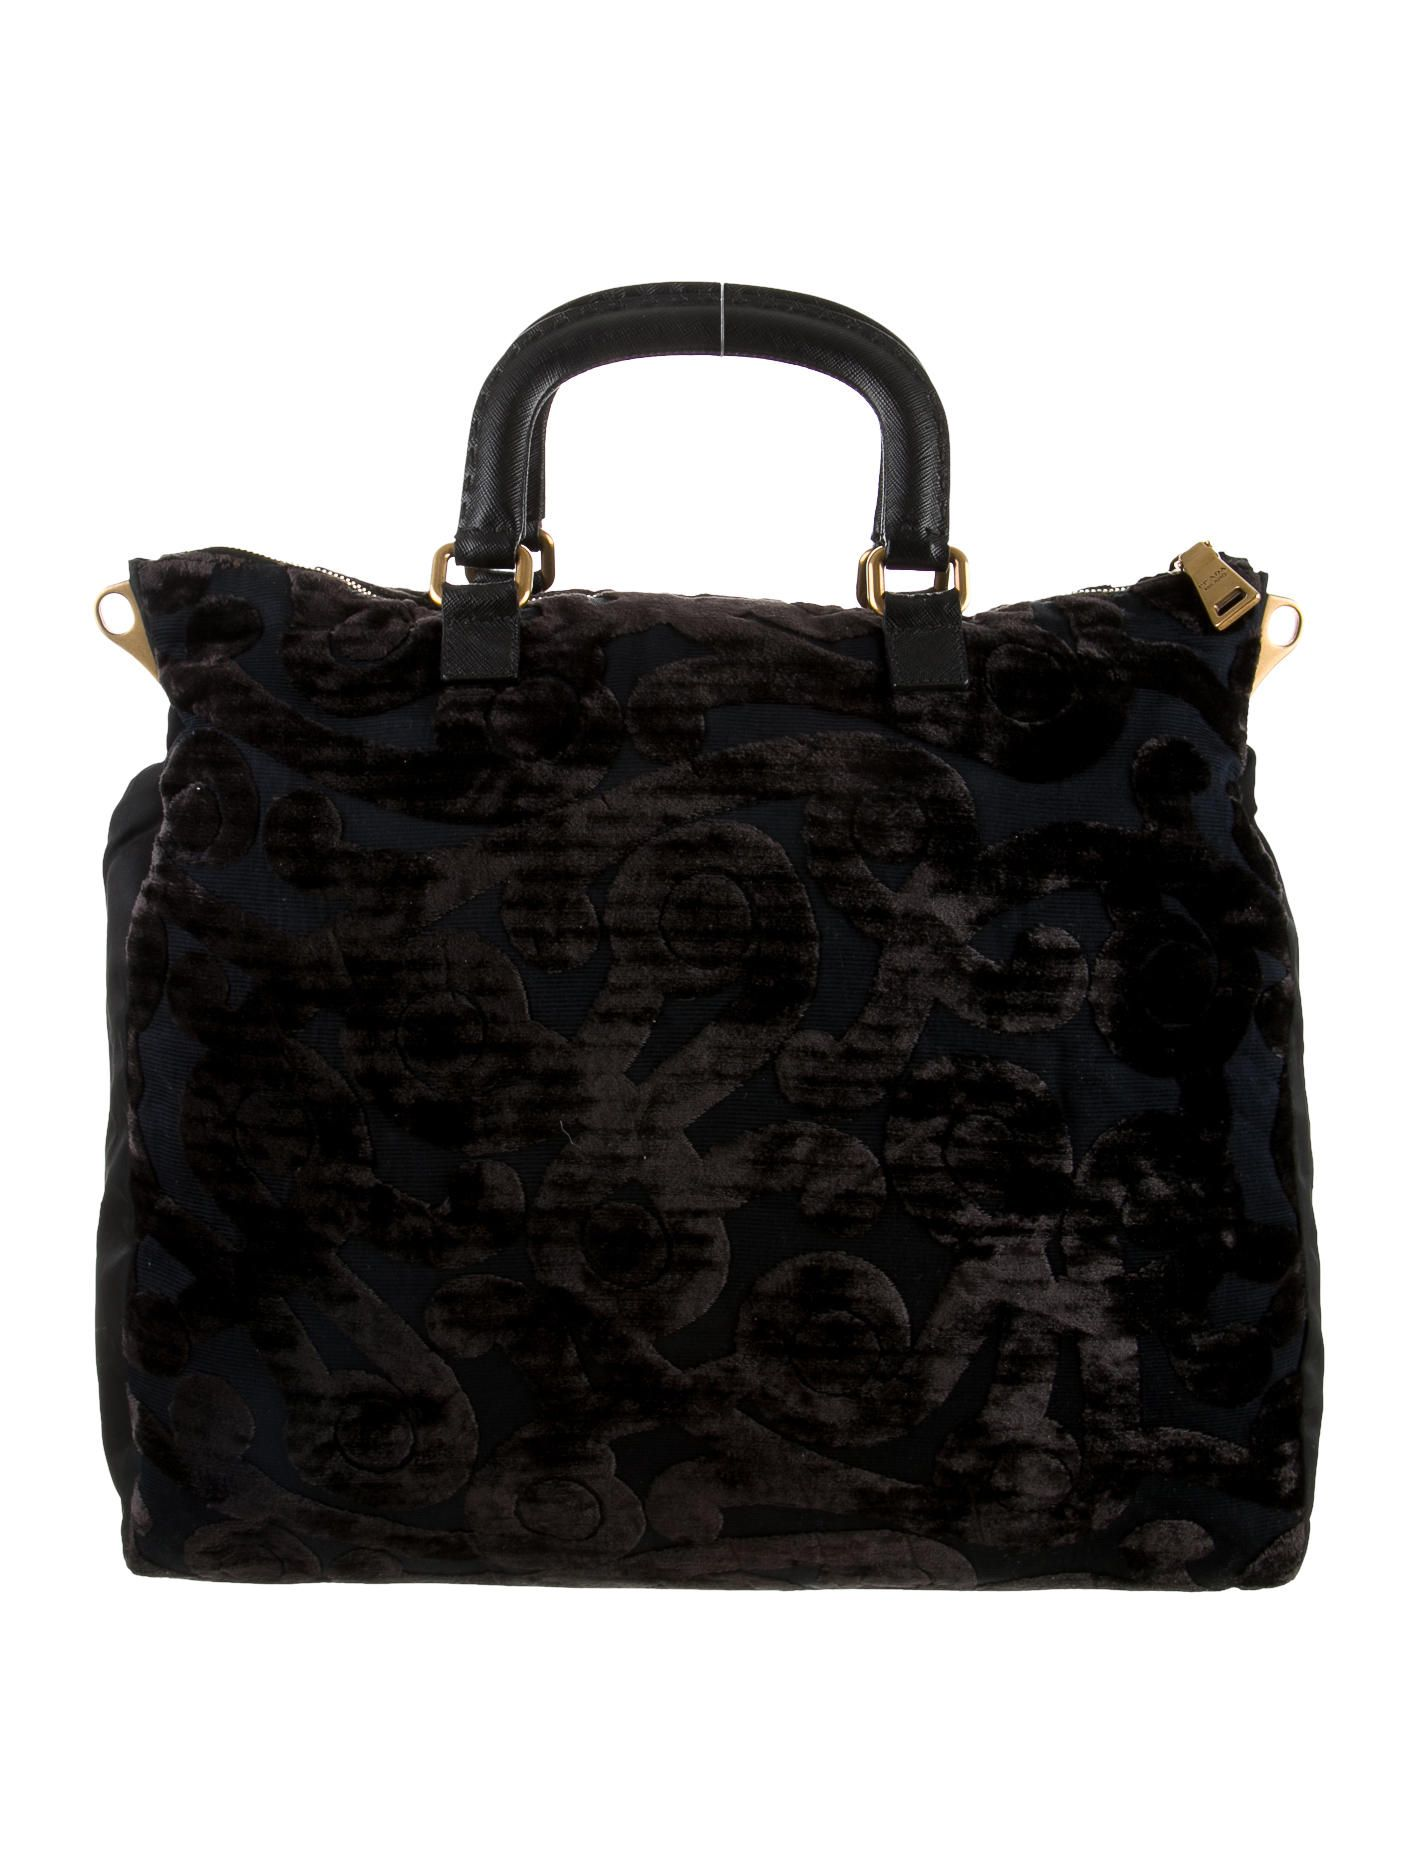 4bf439210fb8 Brown and black velvet Prada Velluto Jacquard tote with gold-tone hardware